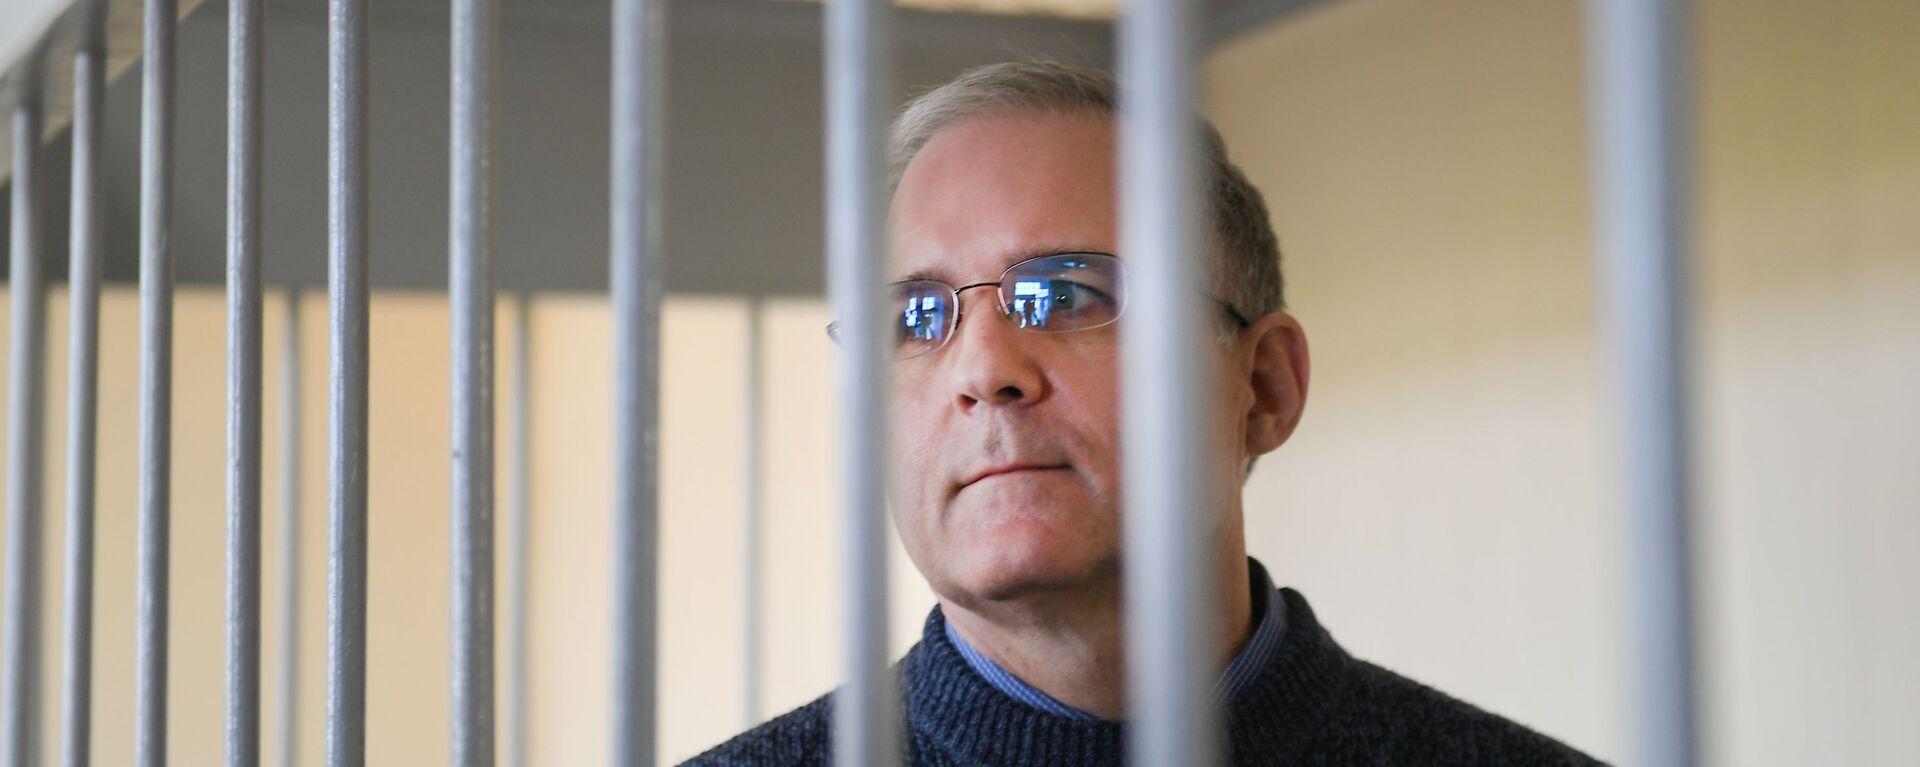 Paul Whelan, ciudadano estadounidense sentenciado en Rusia por espionaje - Sputnik Mundo, 1920, 09.07.2020